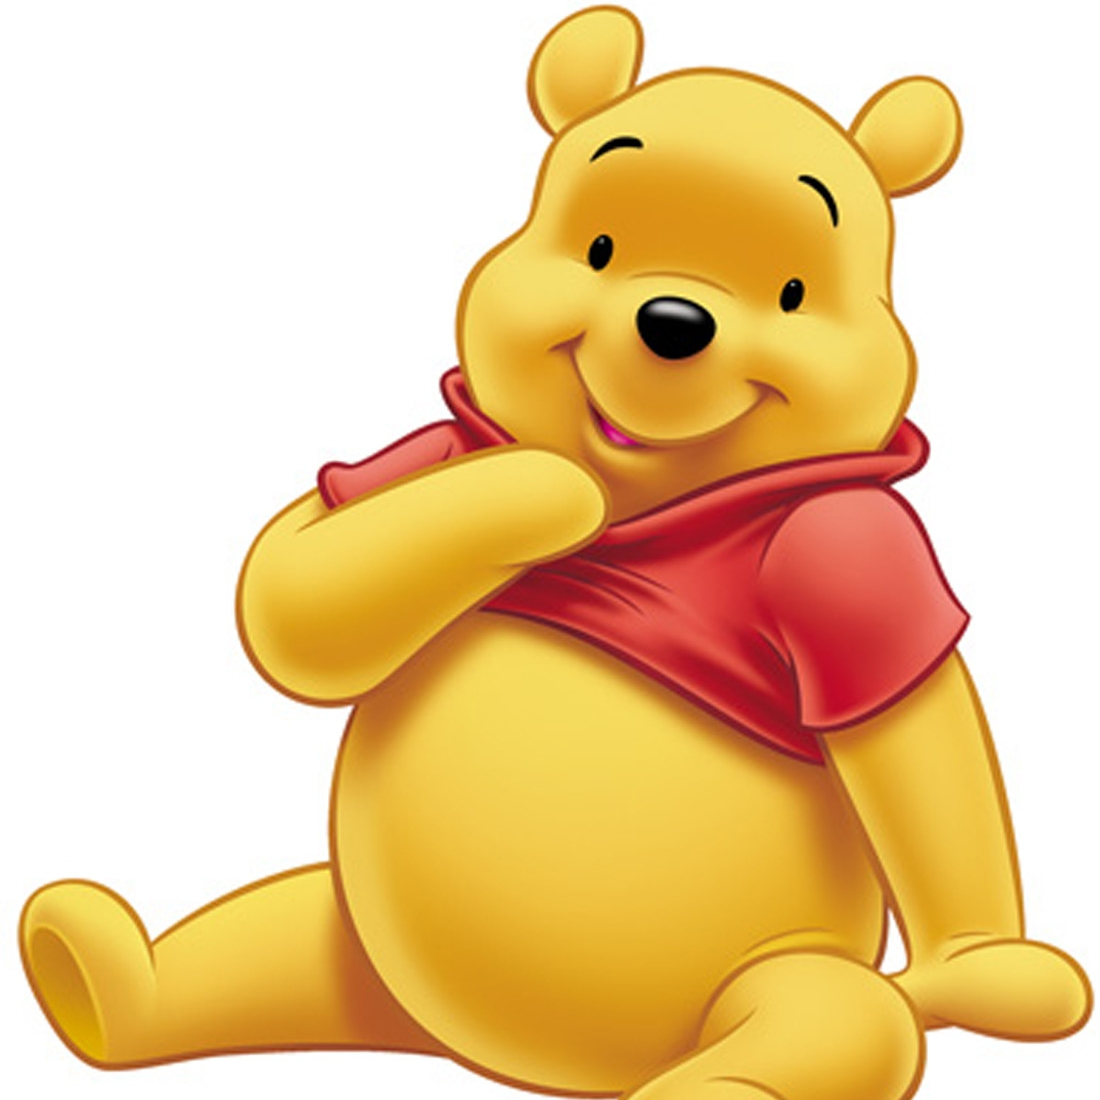 Winnie censuré en Chine